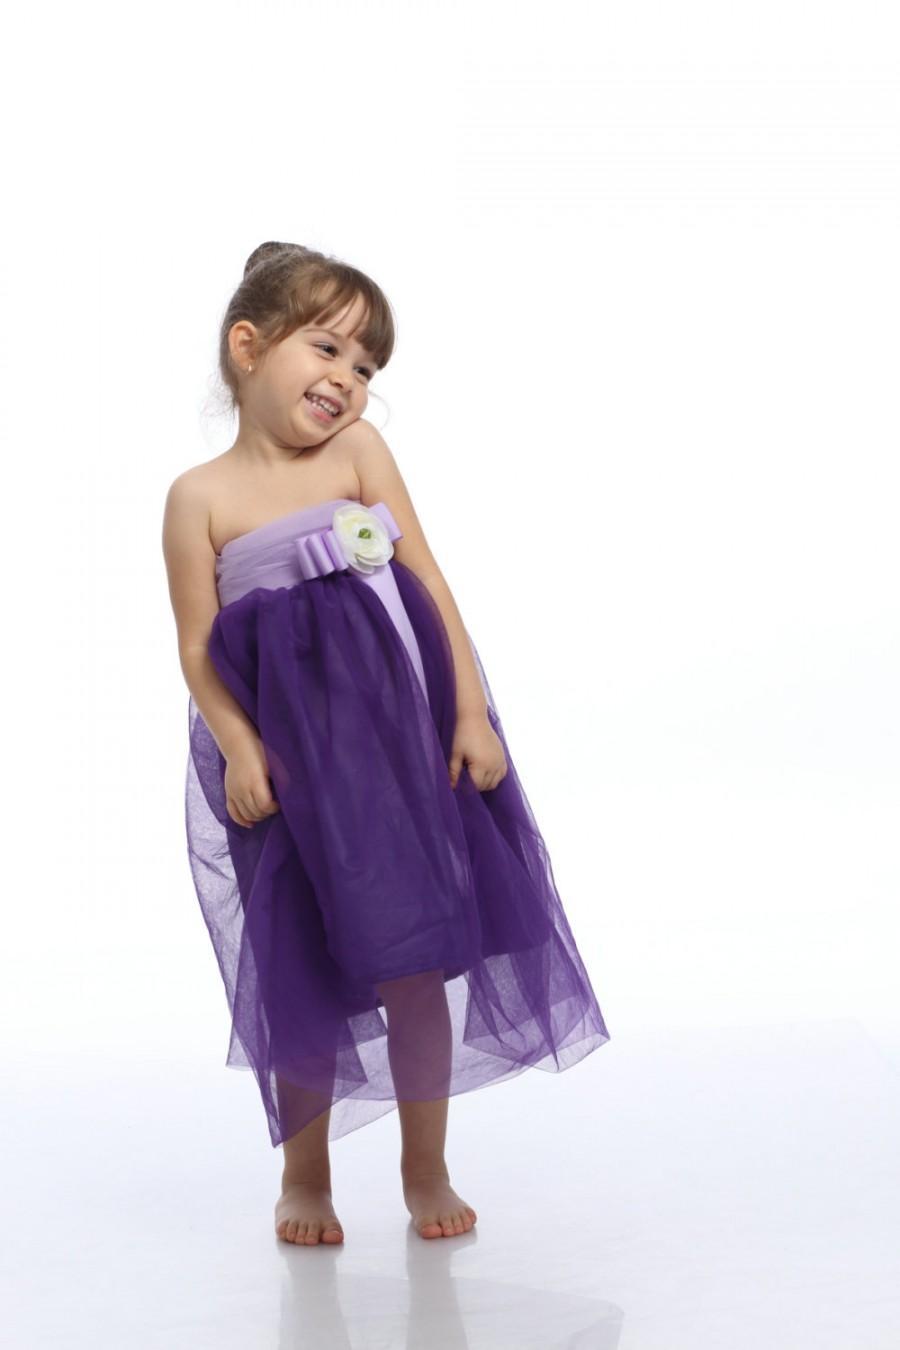 Lavender Dress Kid Gown Purple Tutu Toddler Fairy Birthday Concert